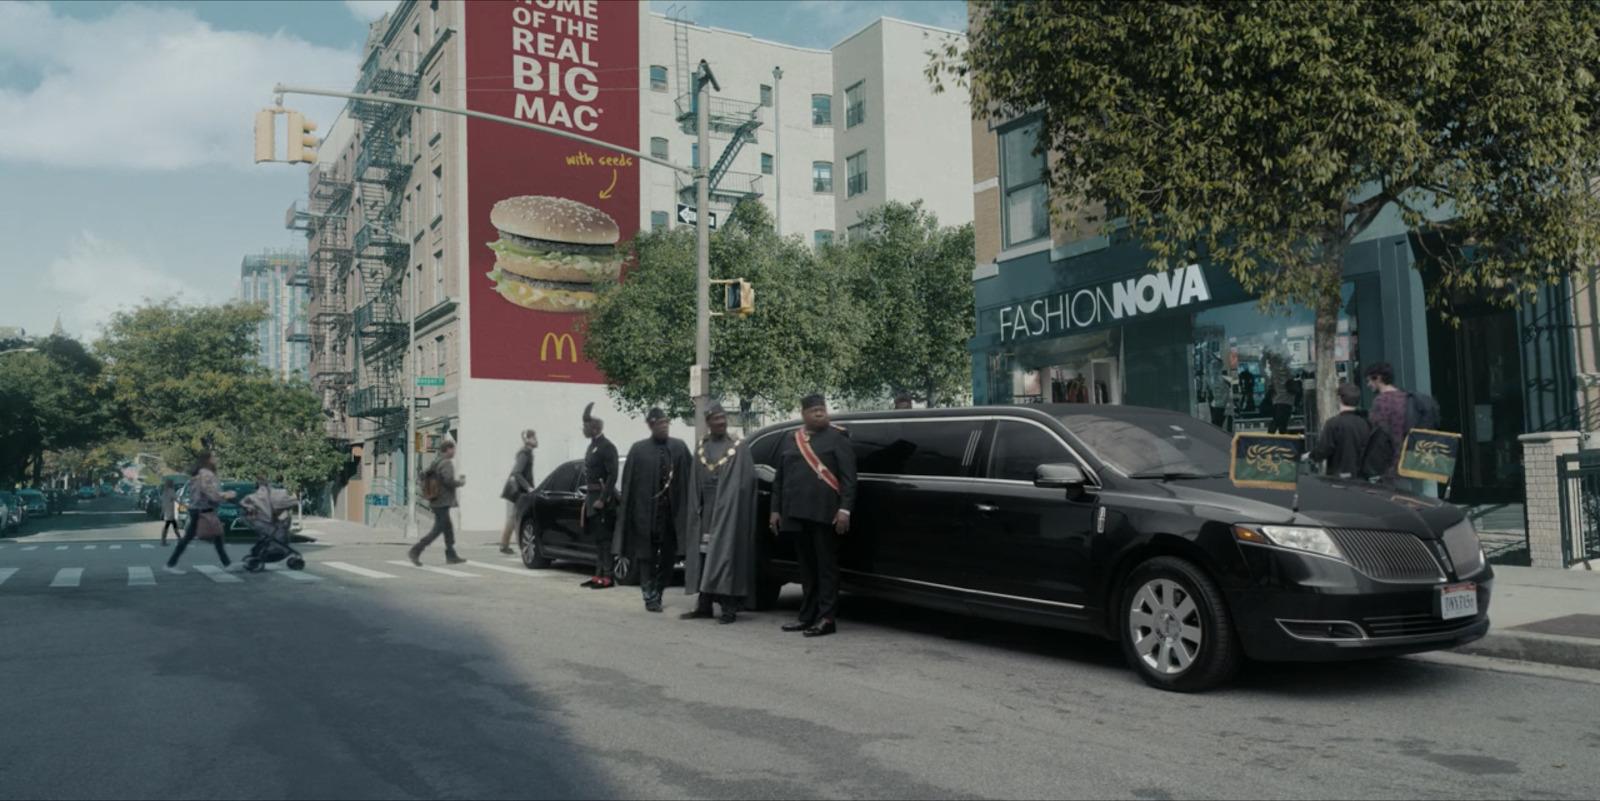 Coming to America Big Mac